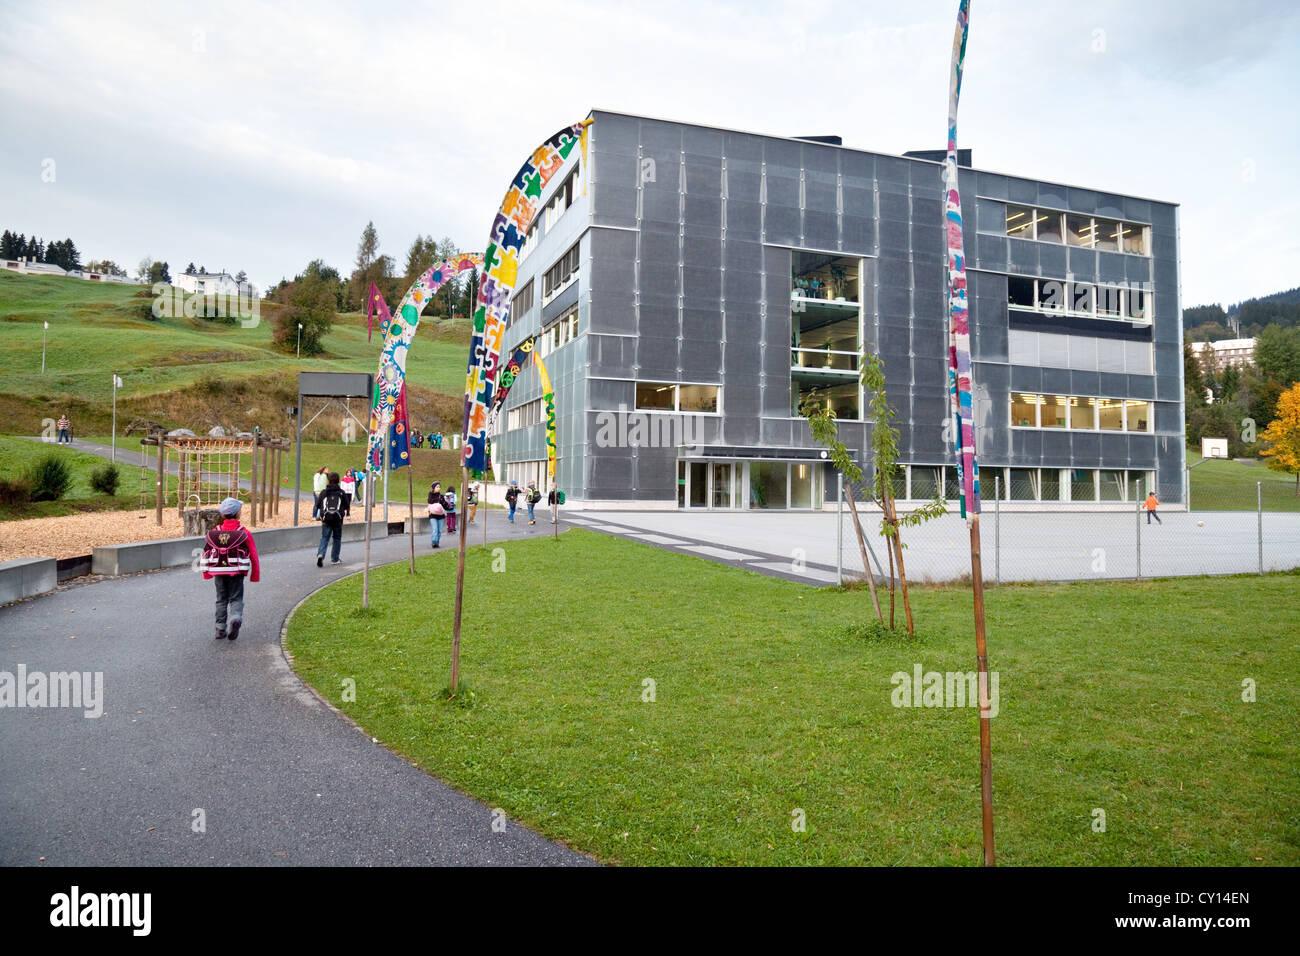 Swiss primary school children going to school, Flims, Switzerland, Europe - Stock Image